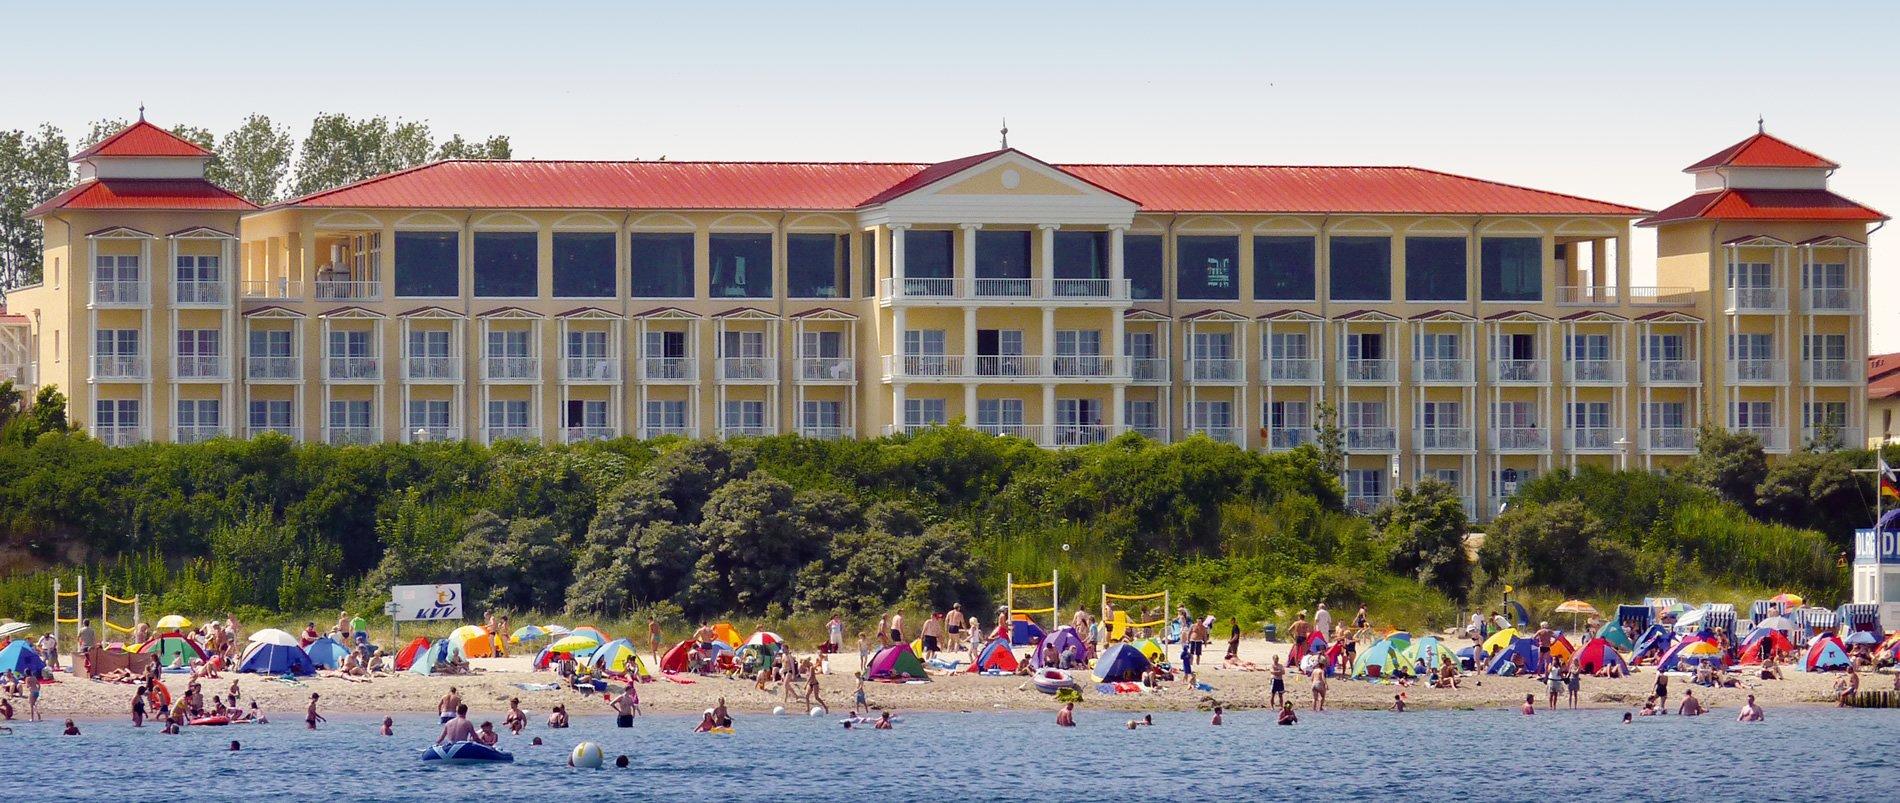 Hotel Kuhlungsborn Morada Strandhotel Direkt An Der Ostsee